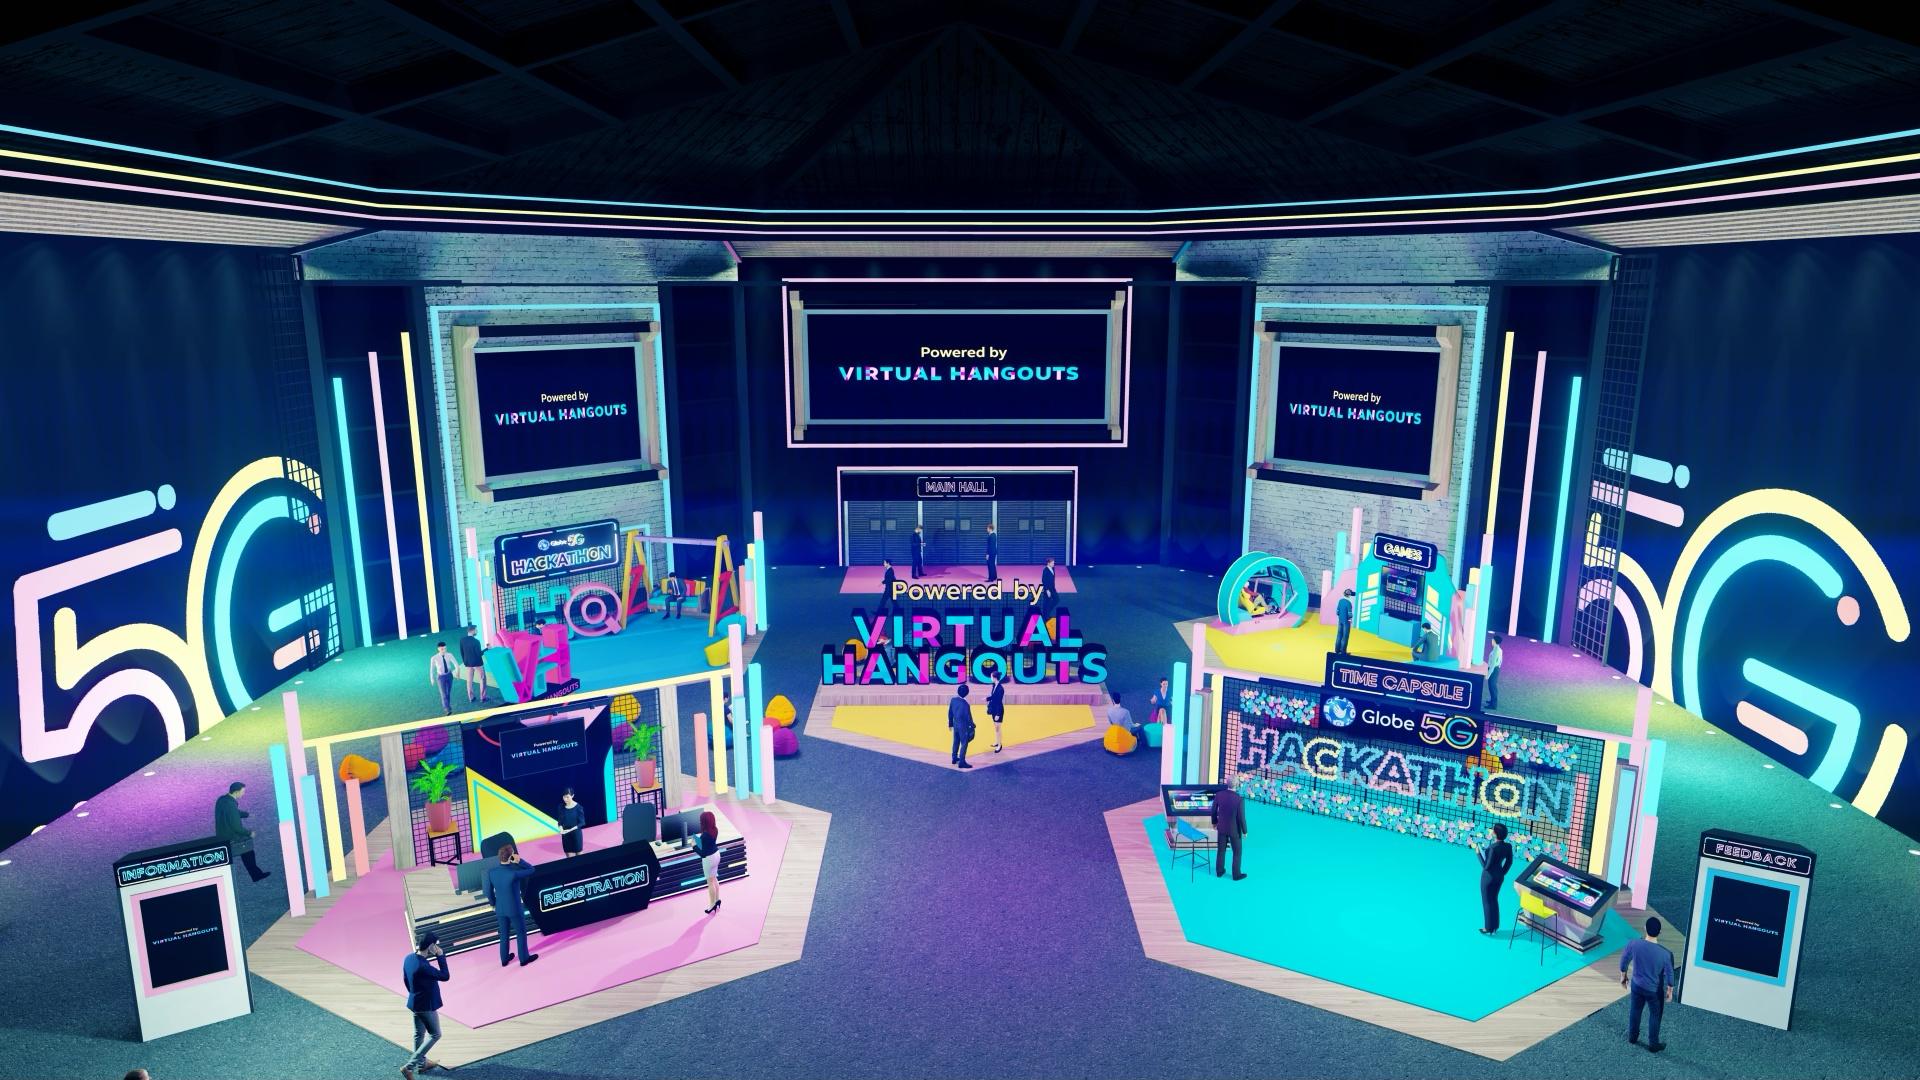 Globe Virtual Hangouts bridging 5G Hackathon to Pinoy youth